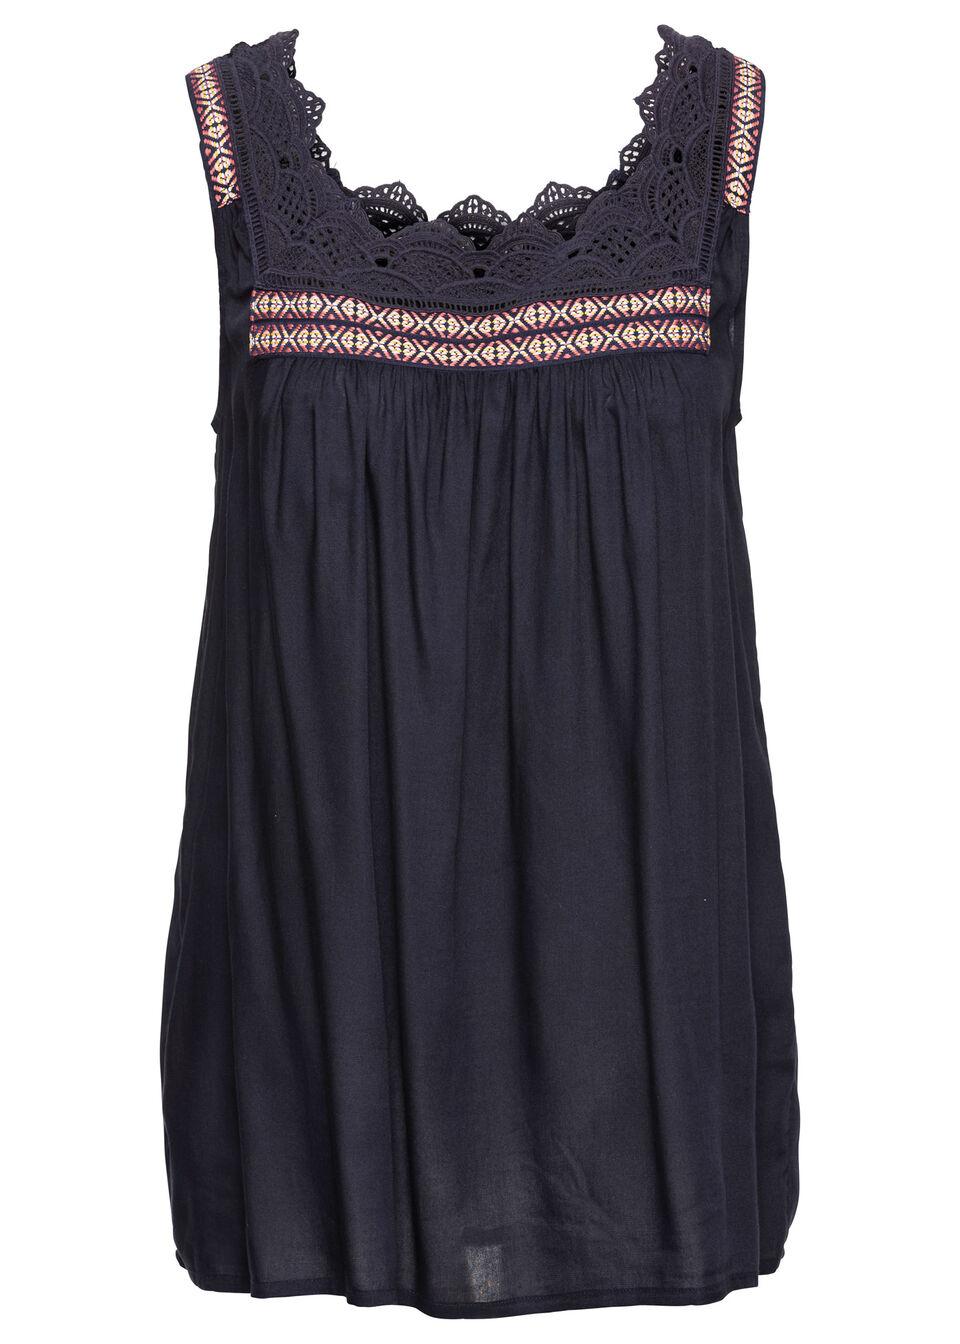 Фото - Блузку с кружевной отделкой от bonprix темно-синего цвета